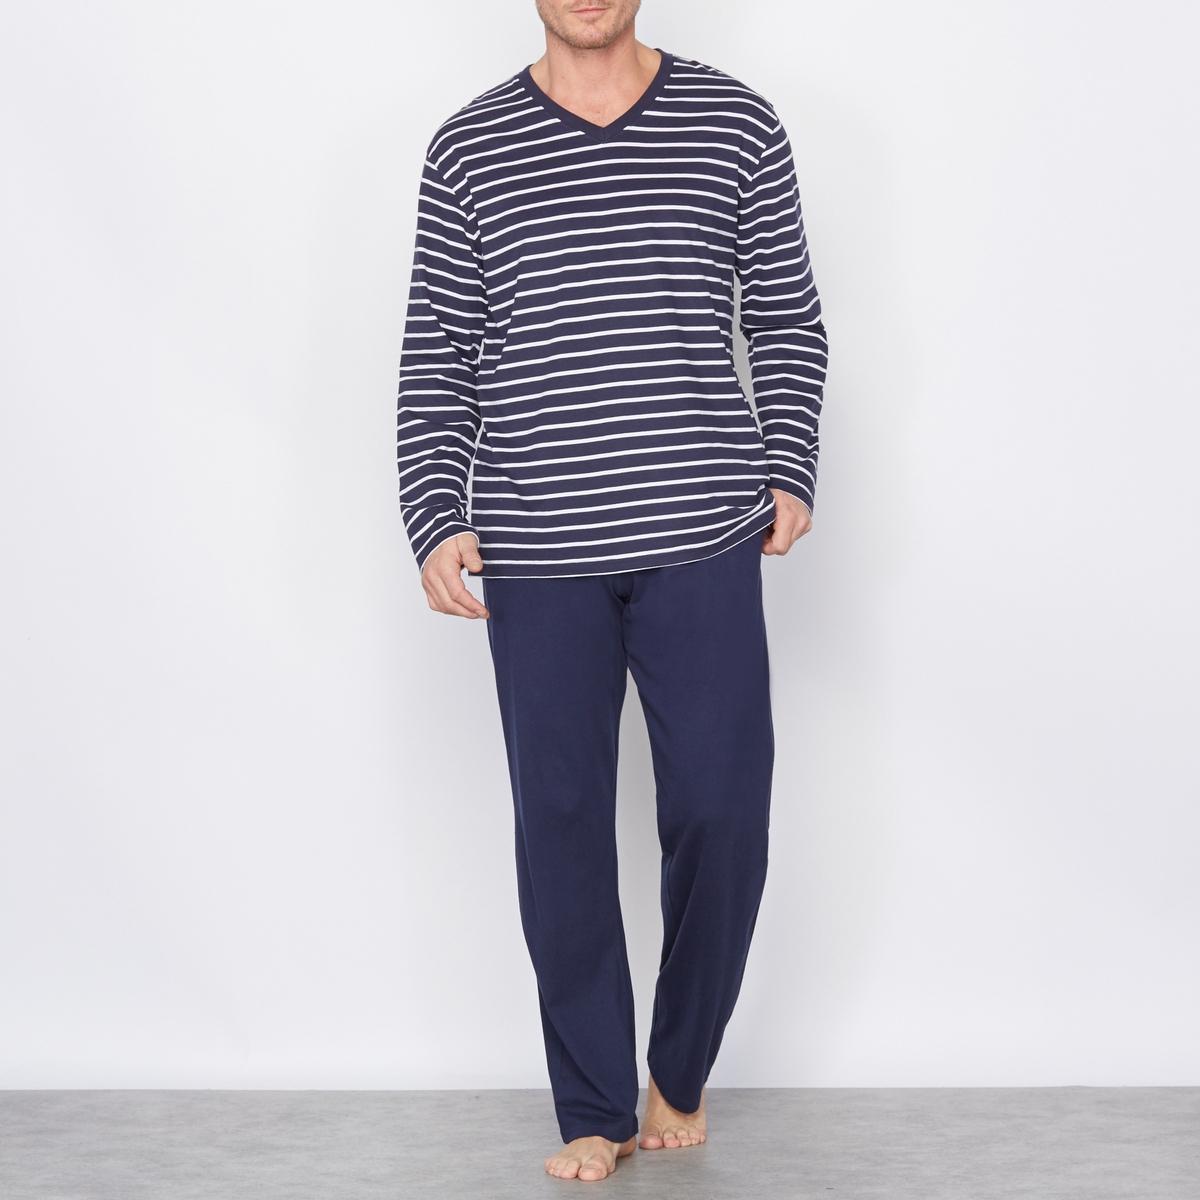 Pijama em jersey puro algodão